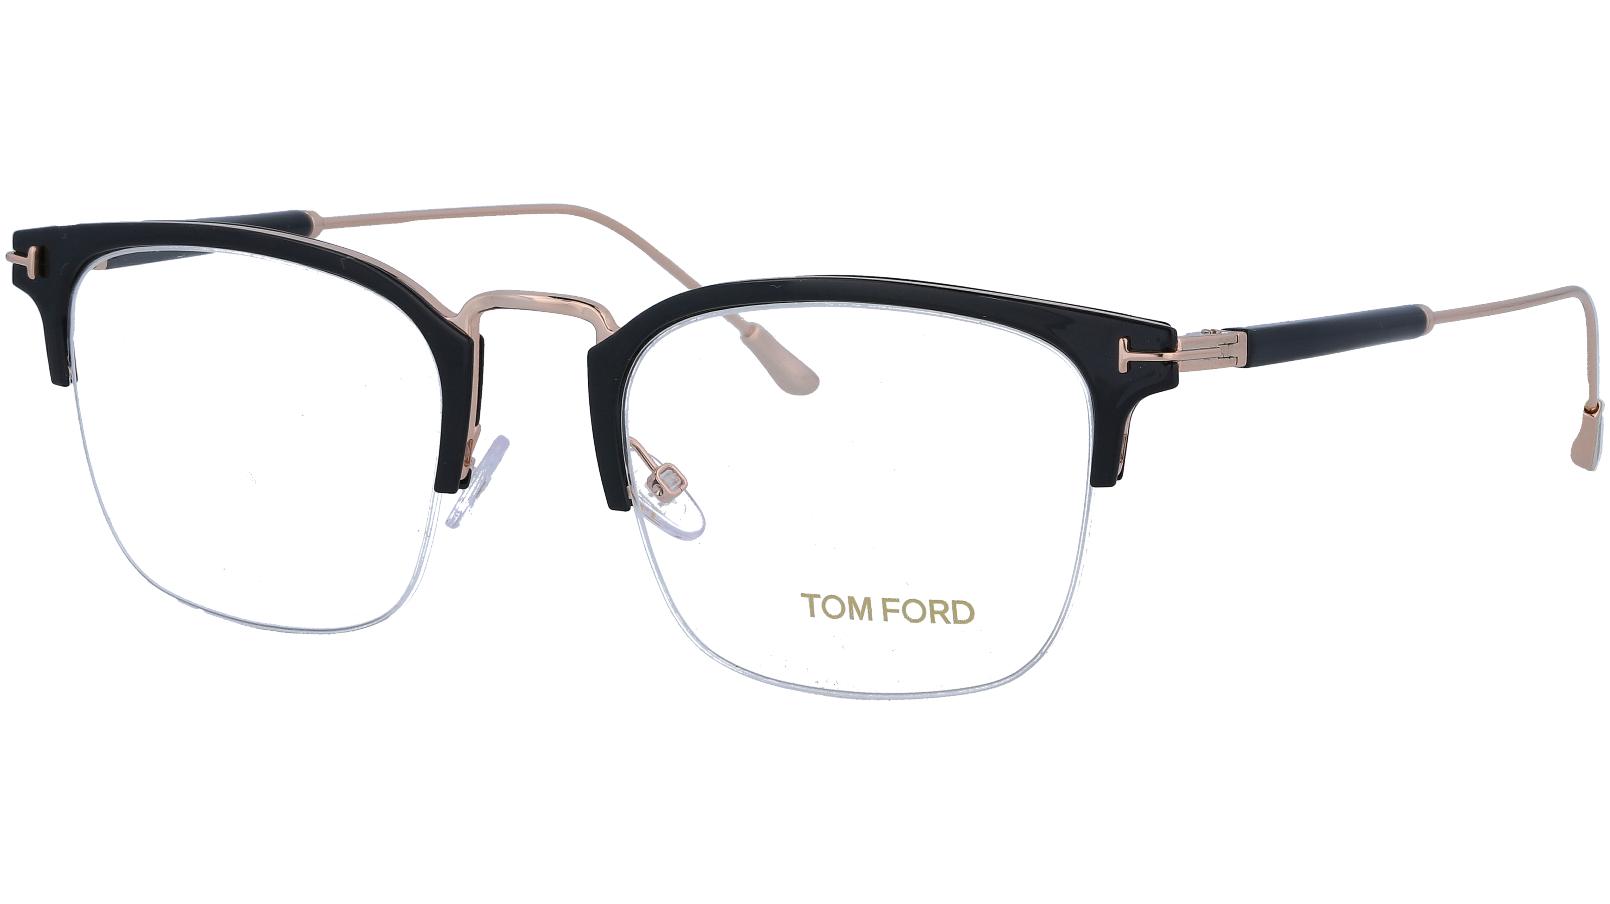 Tom Ford TF5611 001 52 Black Titanium Glasses